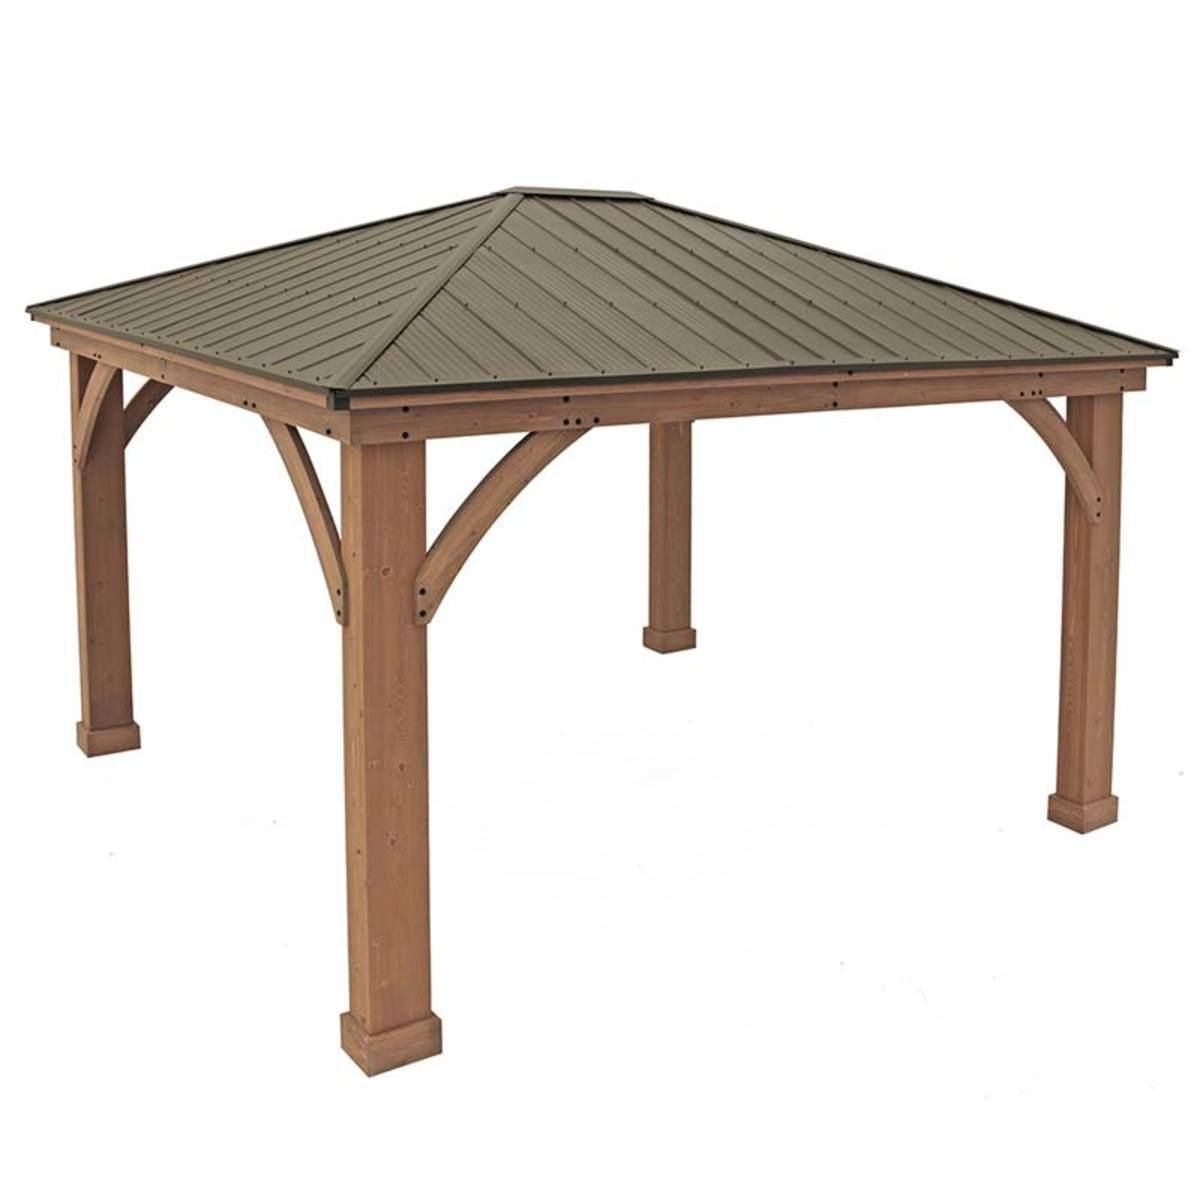 Yardistry 14ft X 12ft 4 3 X 3 7m Cedar Gazebo With Aluminium Roof Costco Uk Gazebo Aluminum Roof Garden Patio Furniture